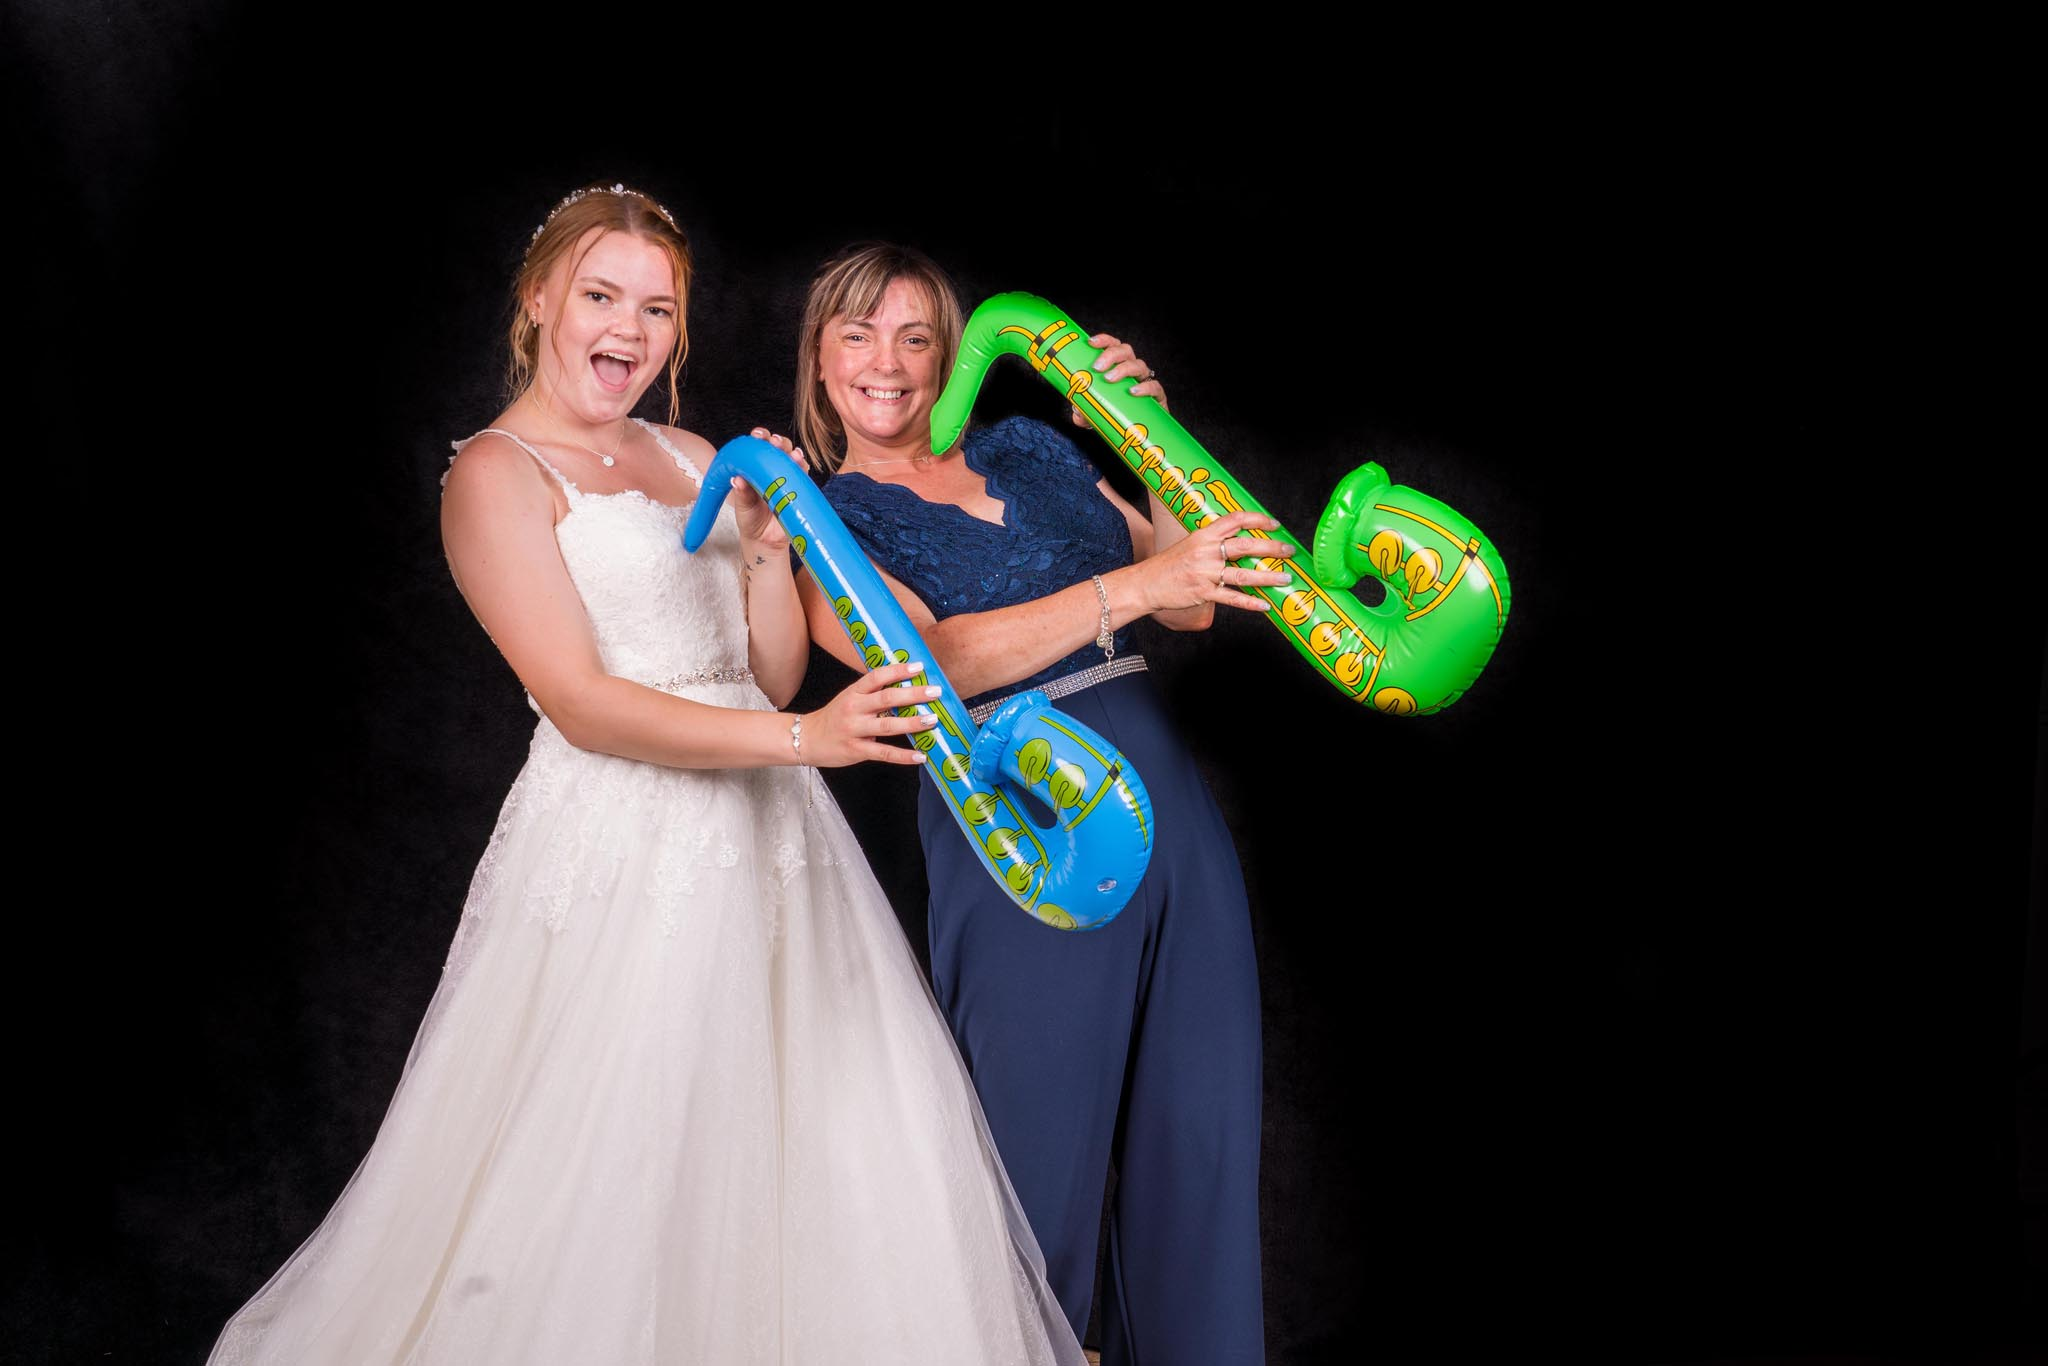 1166-Photo-Booth-Luke-Yasmin-The-Rayleigh-Club-Wedding-Photography.jpg